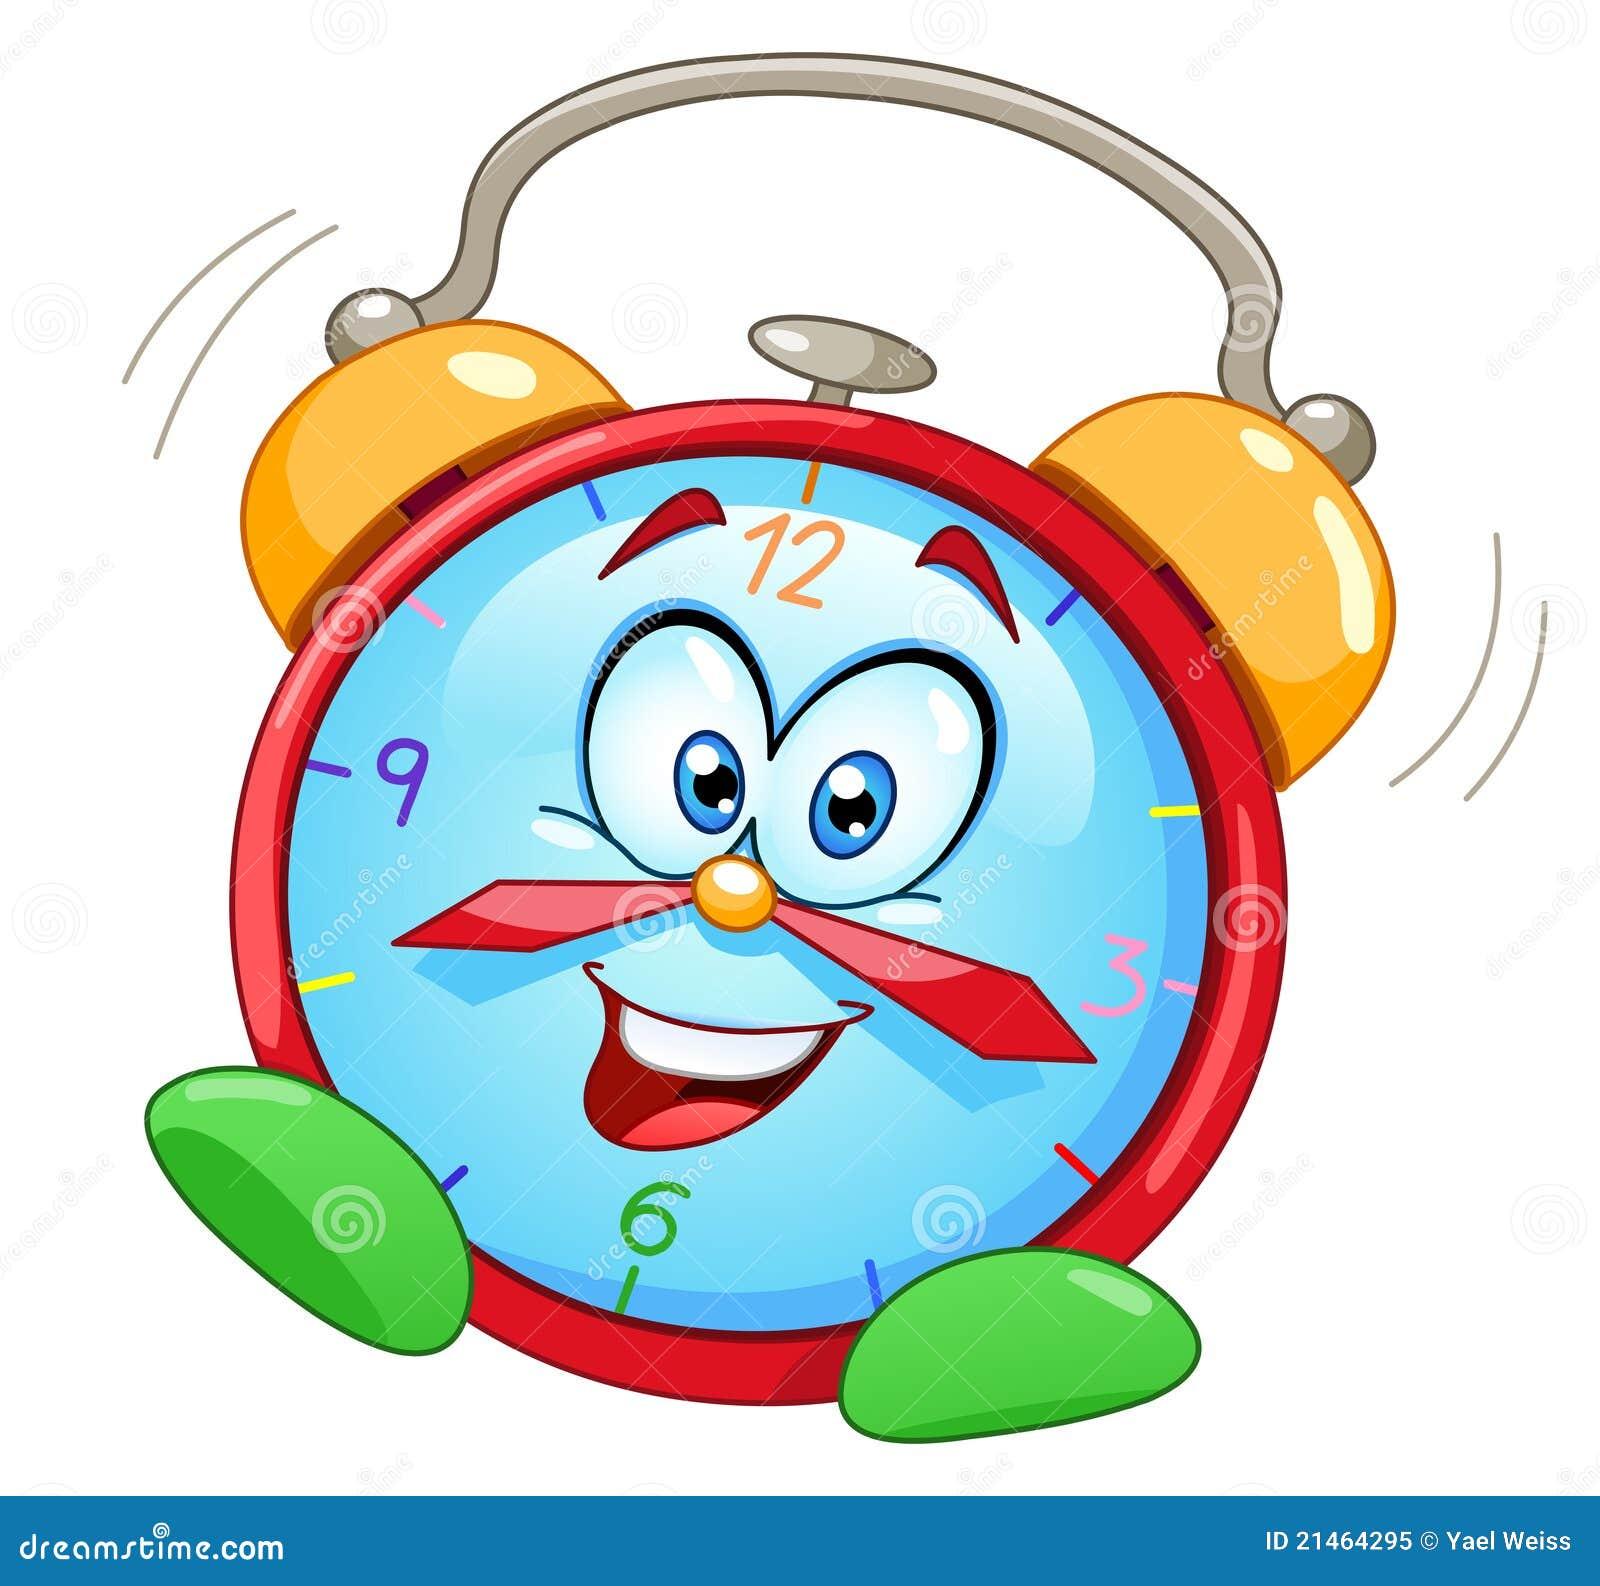 cartoon alarm clock royalty free stock photo image 21464295 Running Silhouette Sad Clip Art